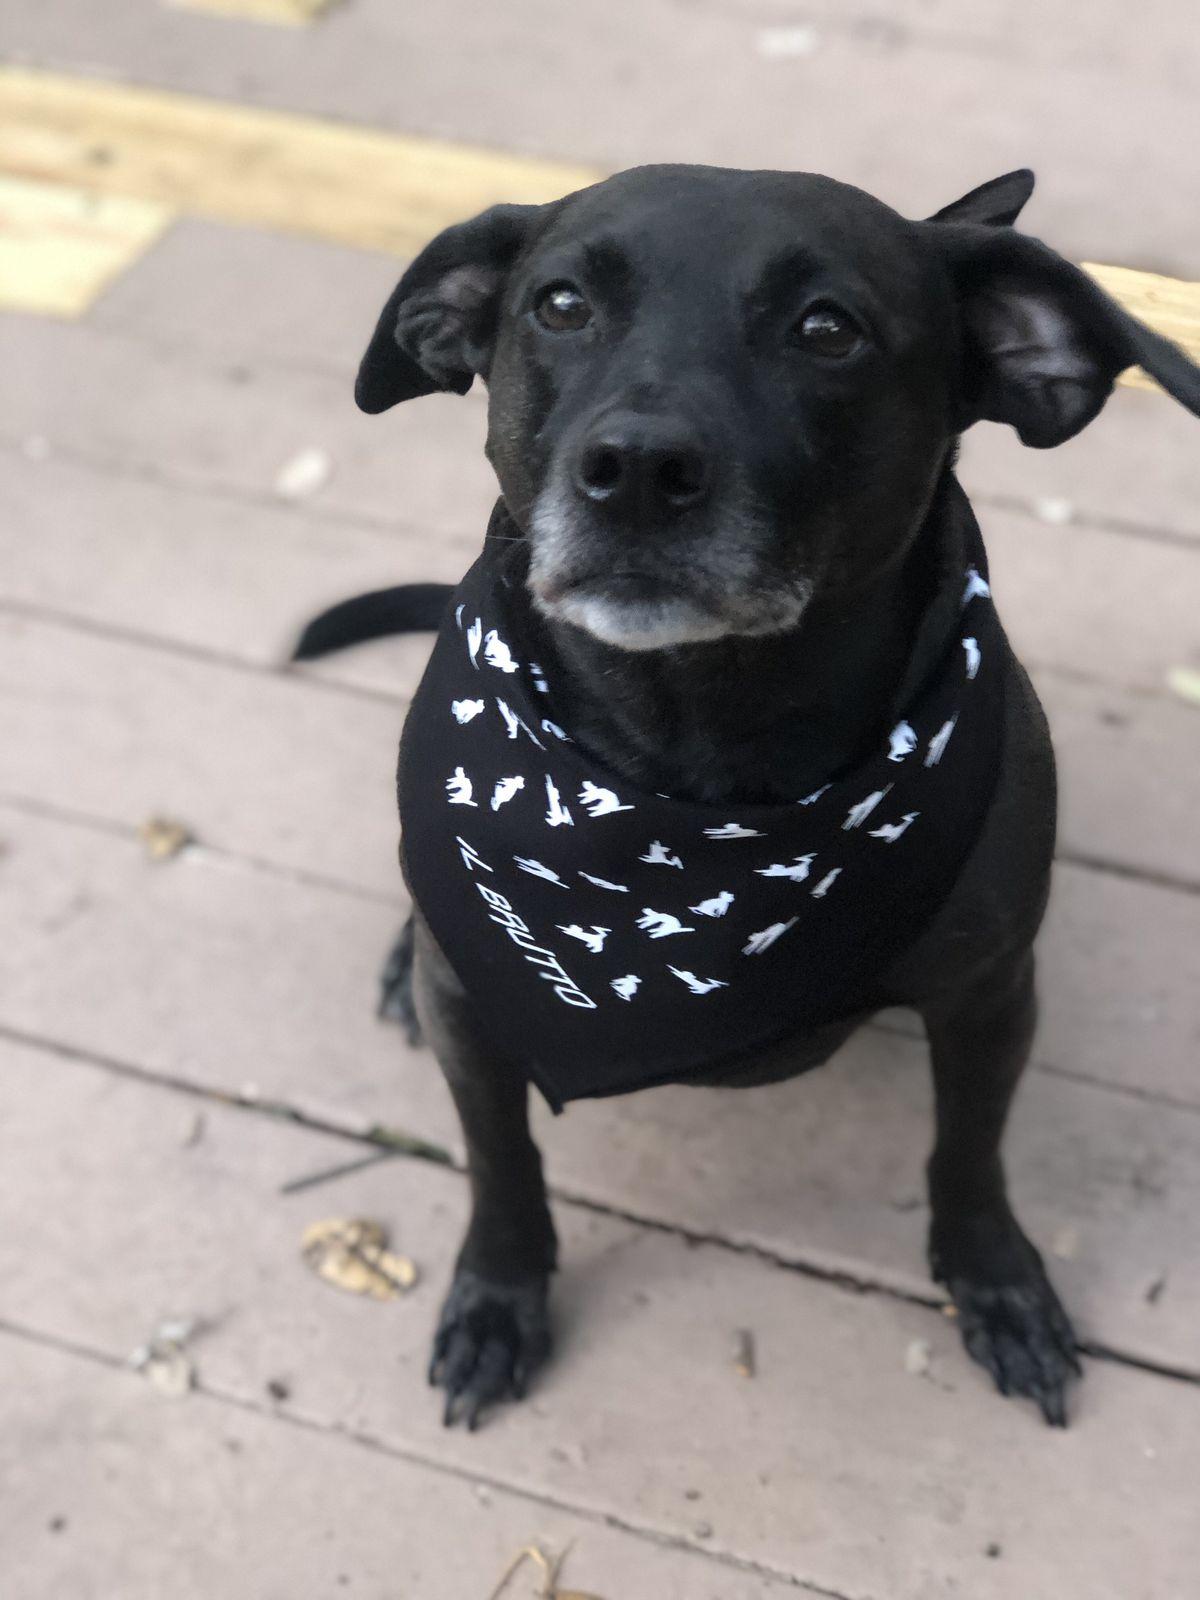 A puppy wearing an Il Brutto bandana